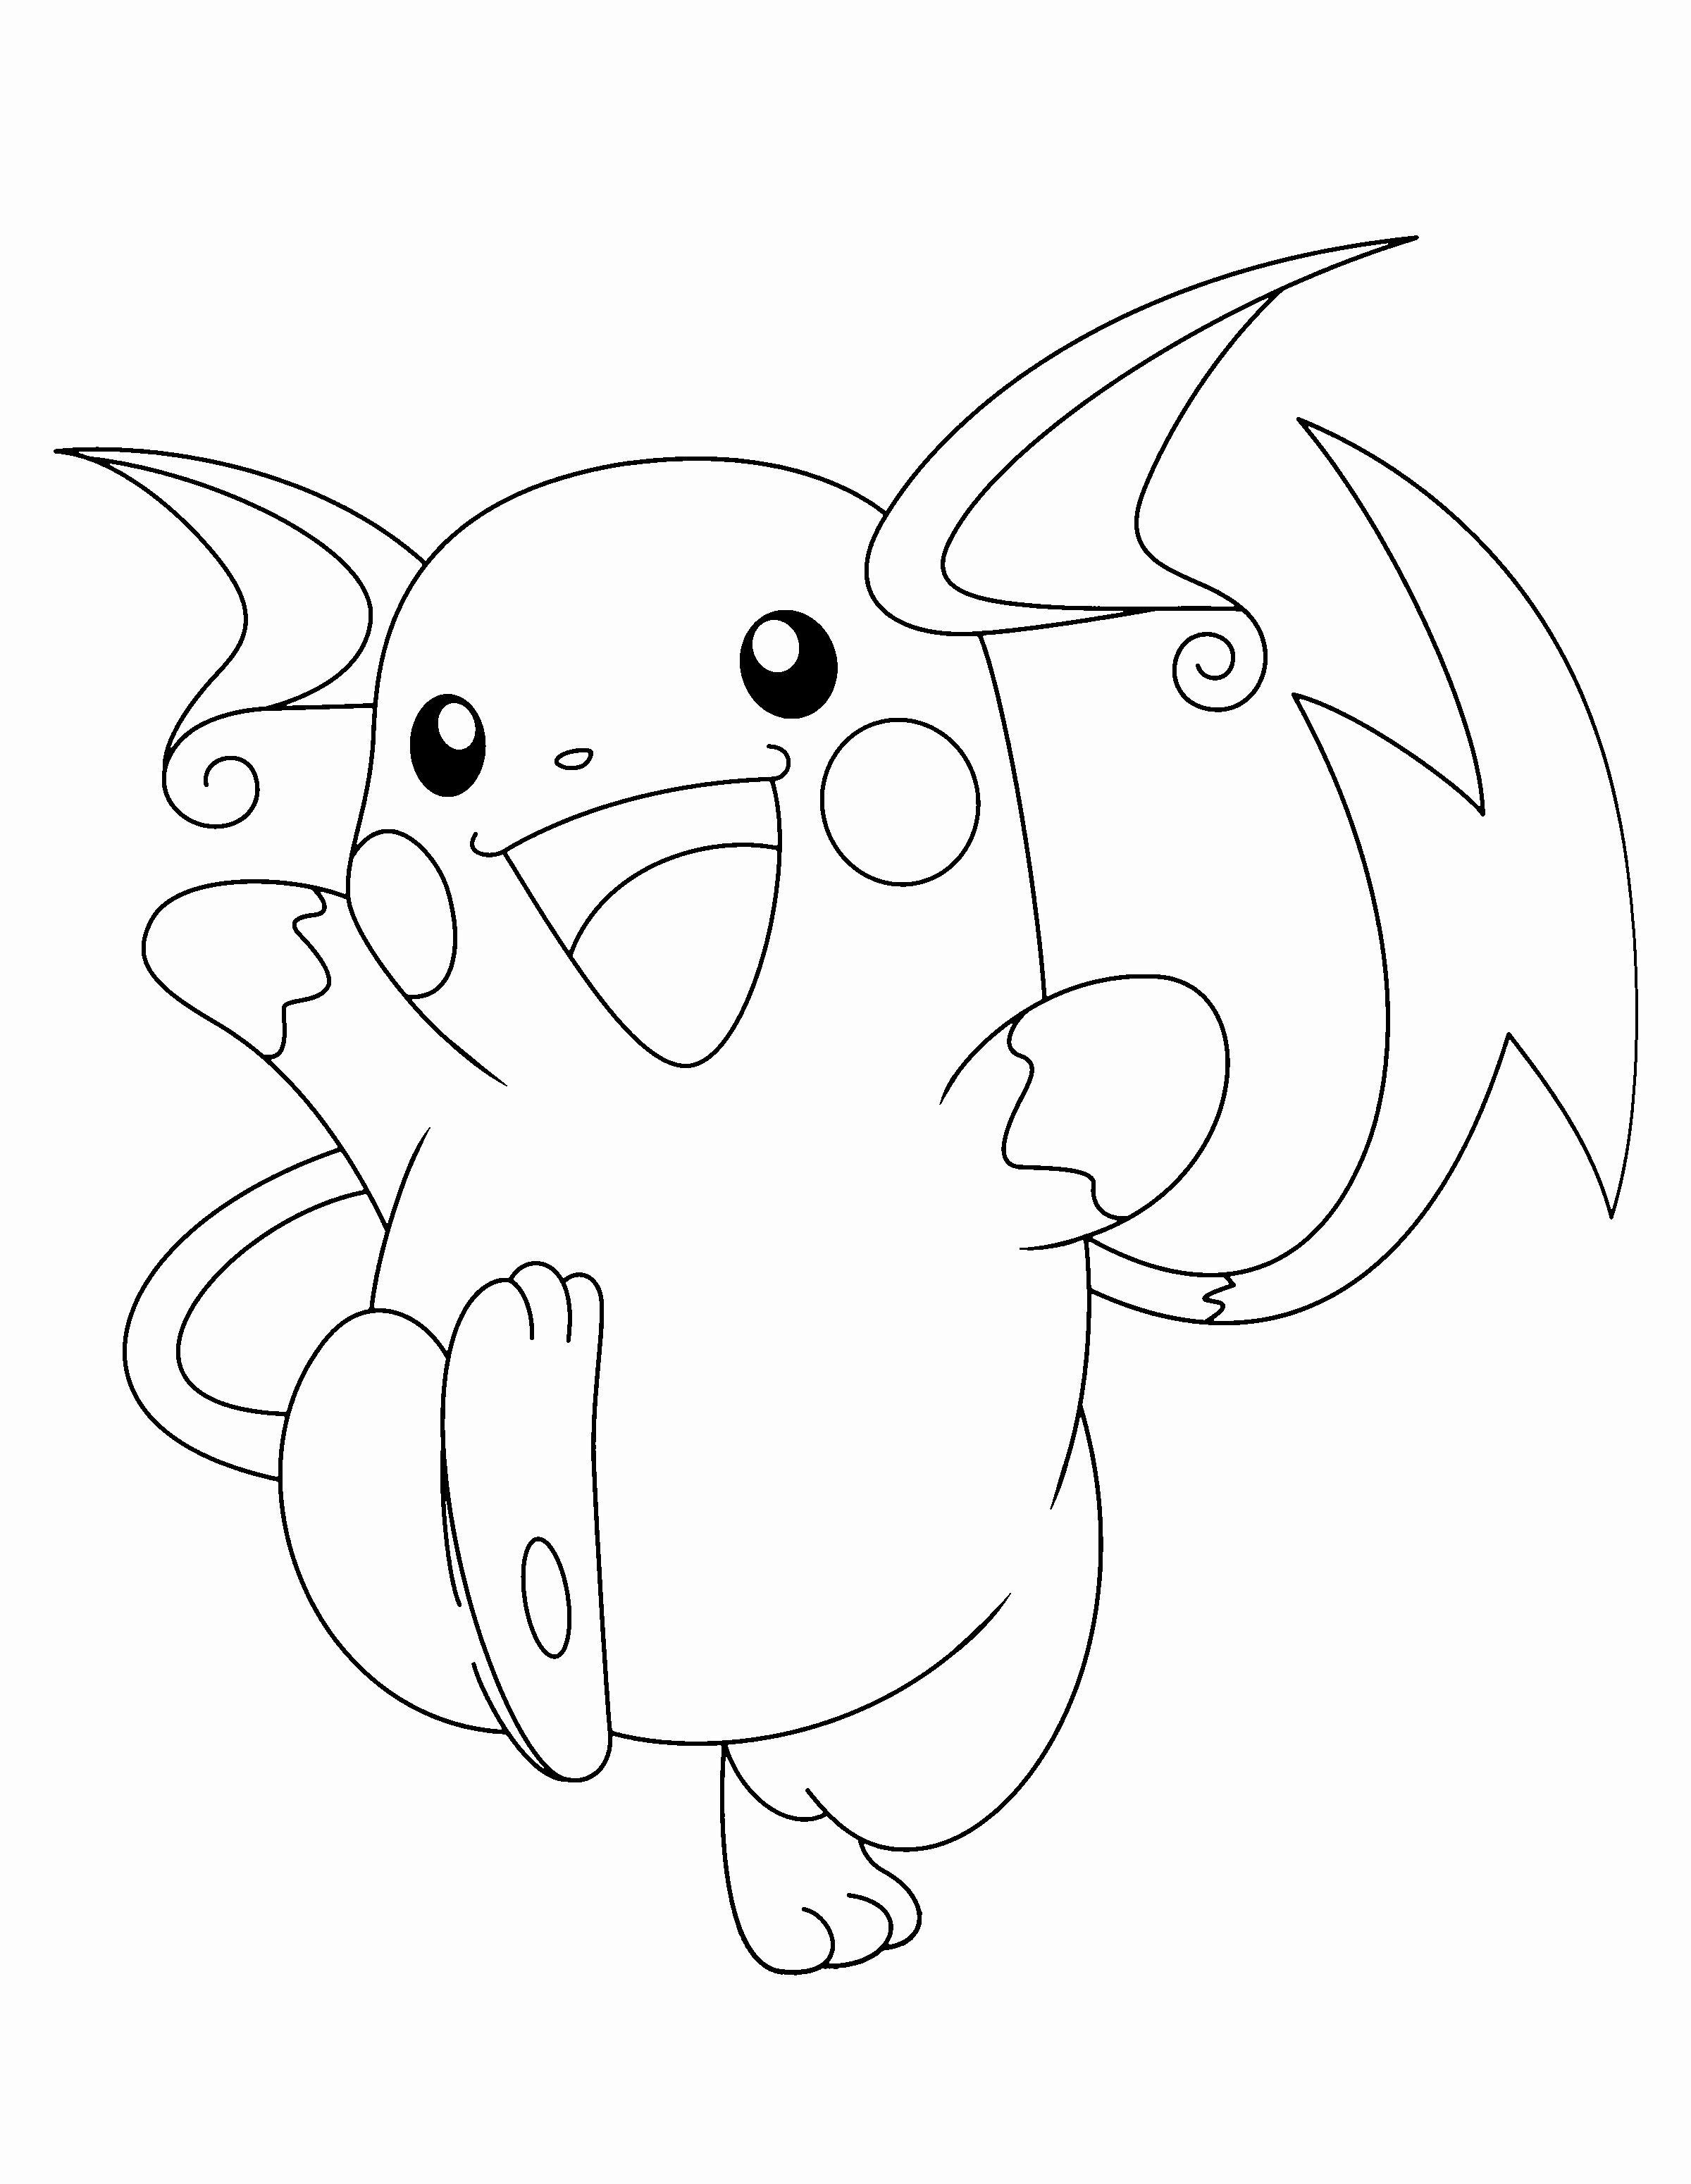 Alolan Raichu Coloring Page Awesome Raichu Drawing At Getdrawings Pokemon Coloring Pages Pokemon Coloring Moon Coloring Pages